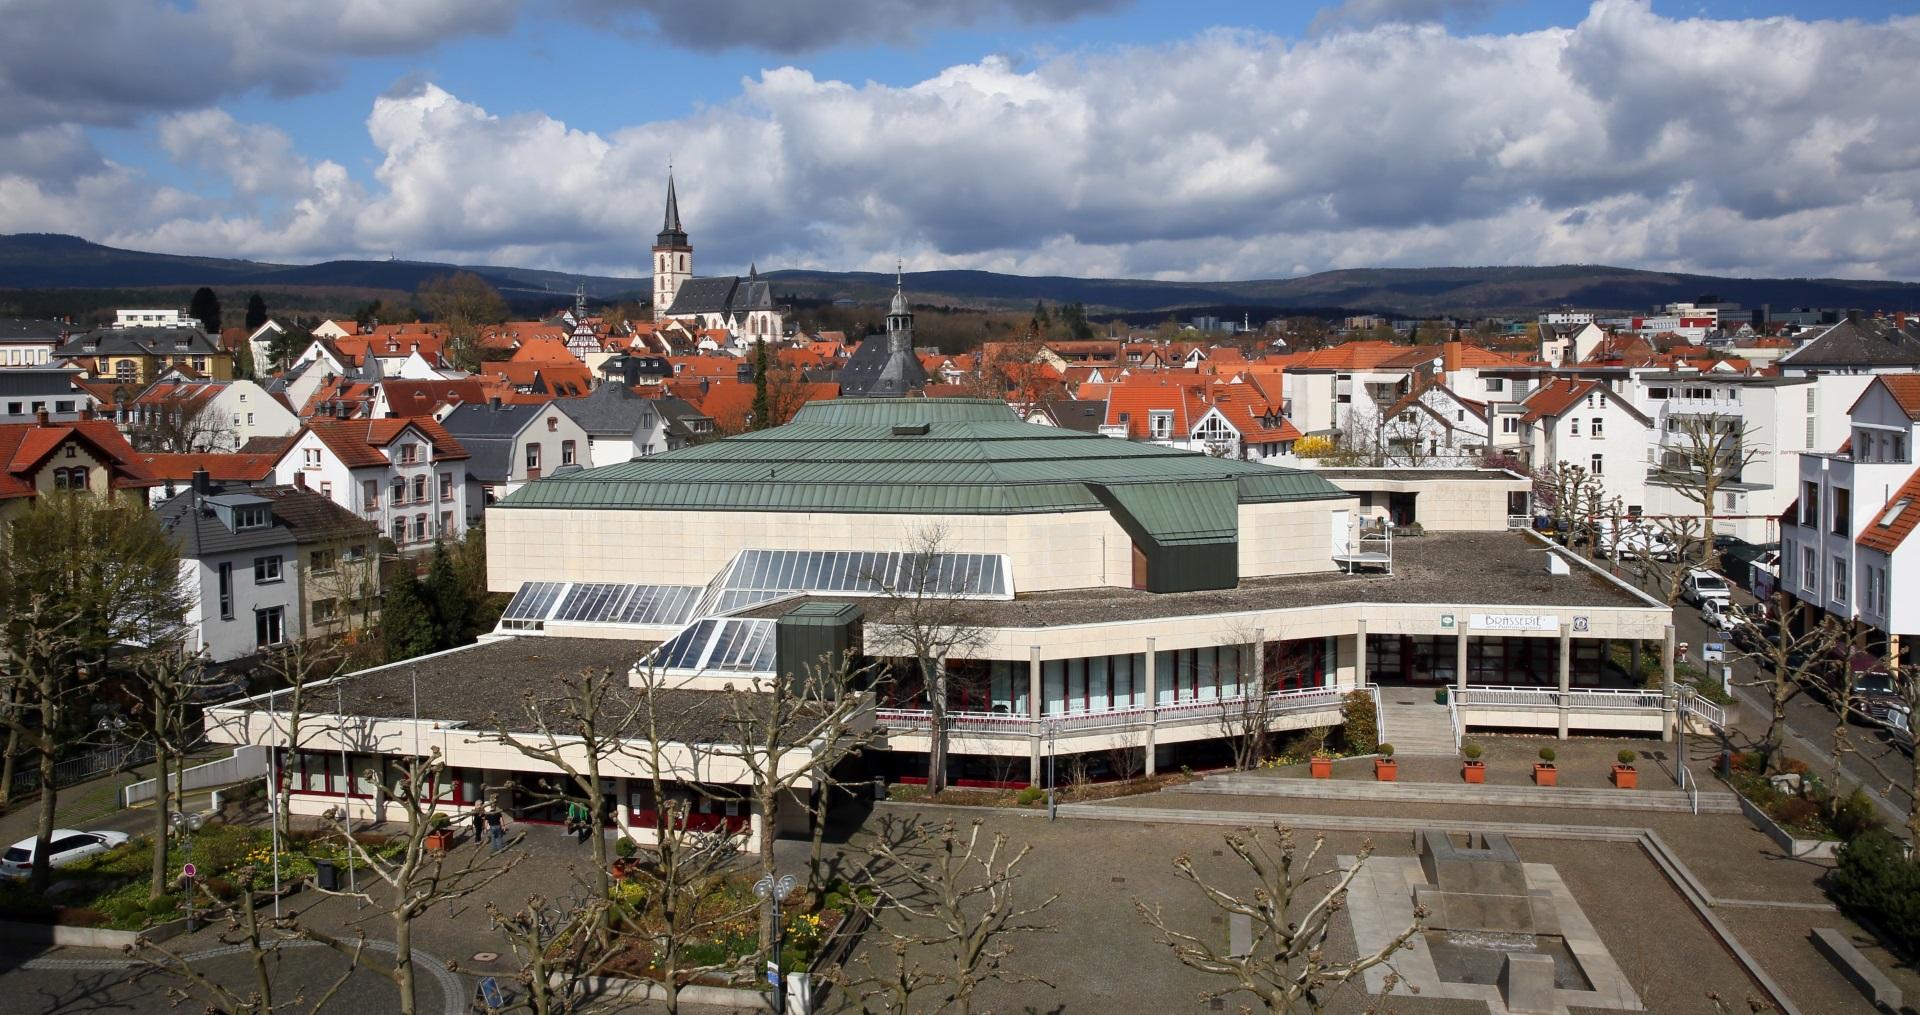 Stadthalle Oberursel